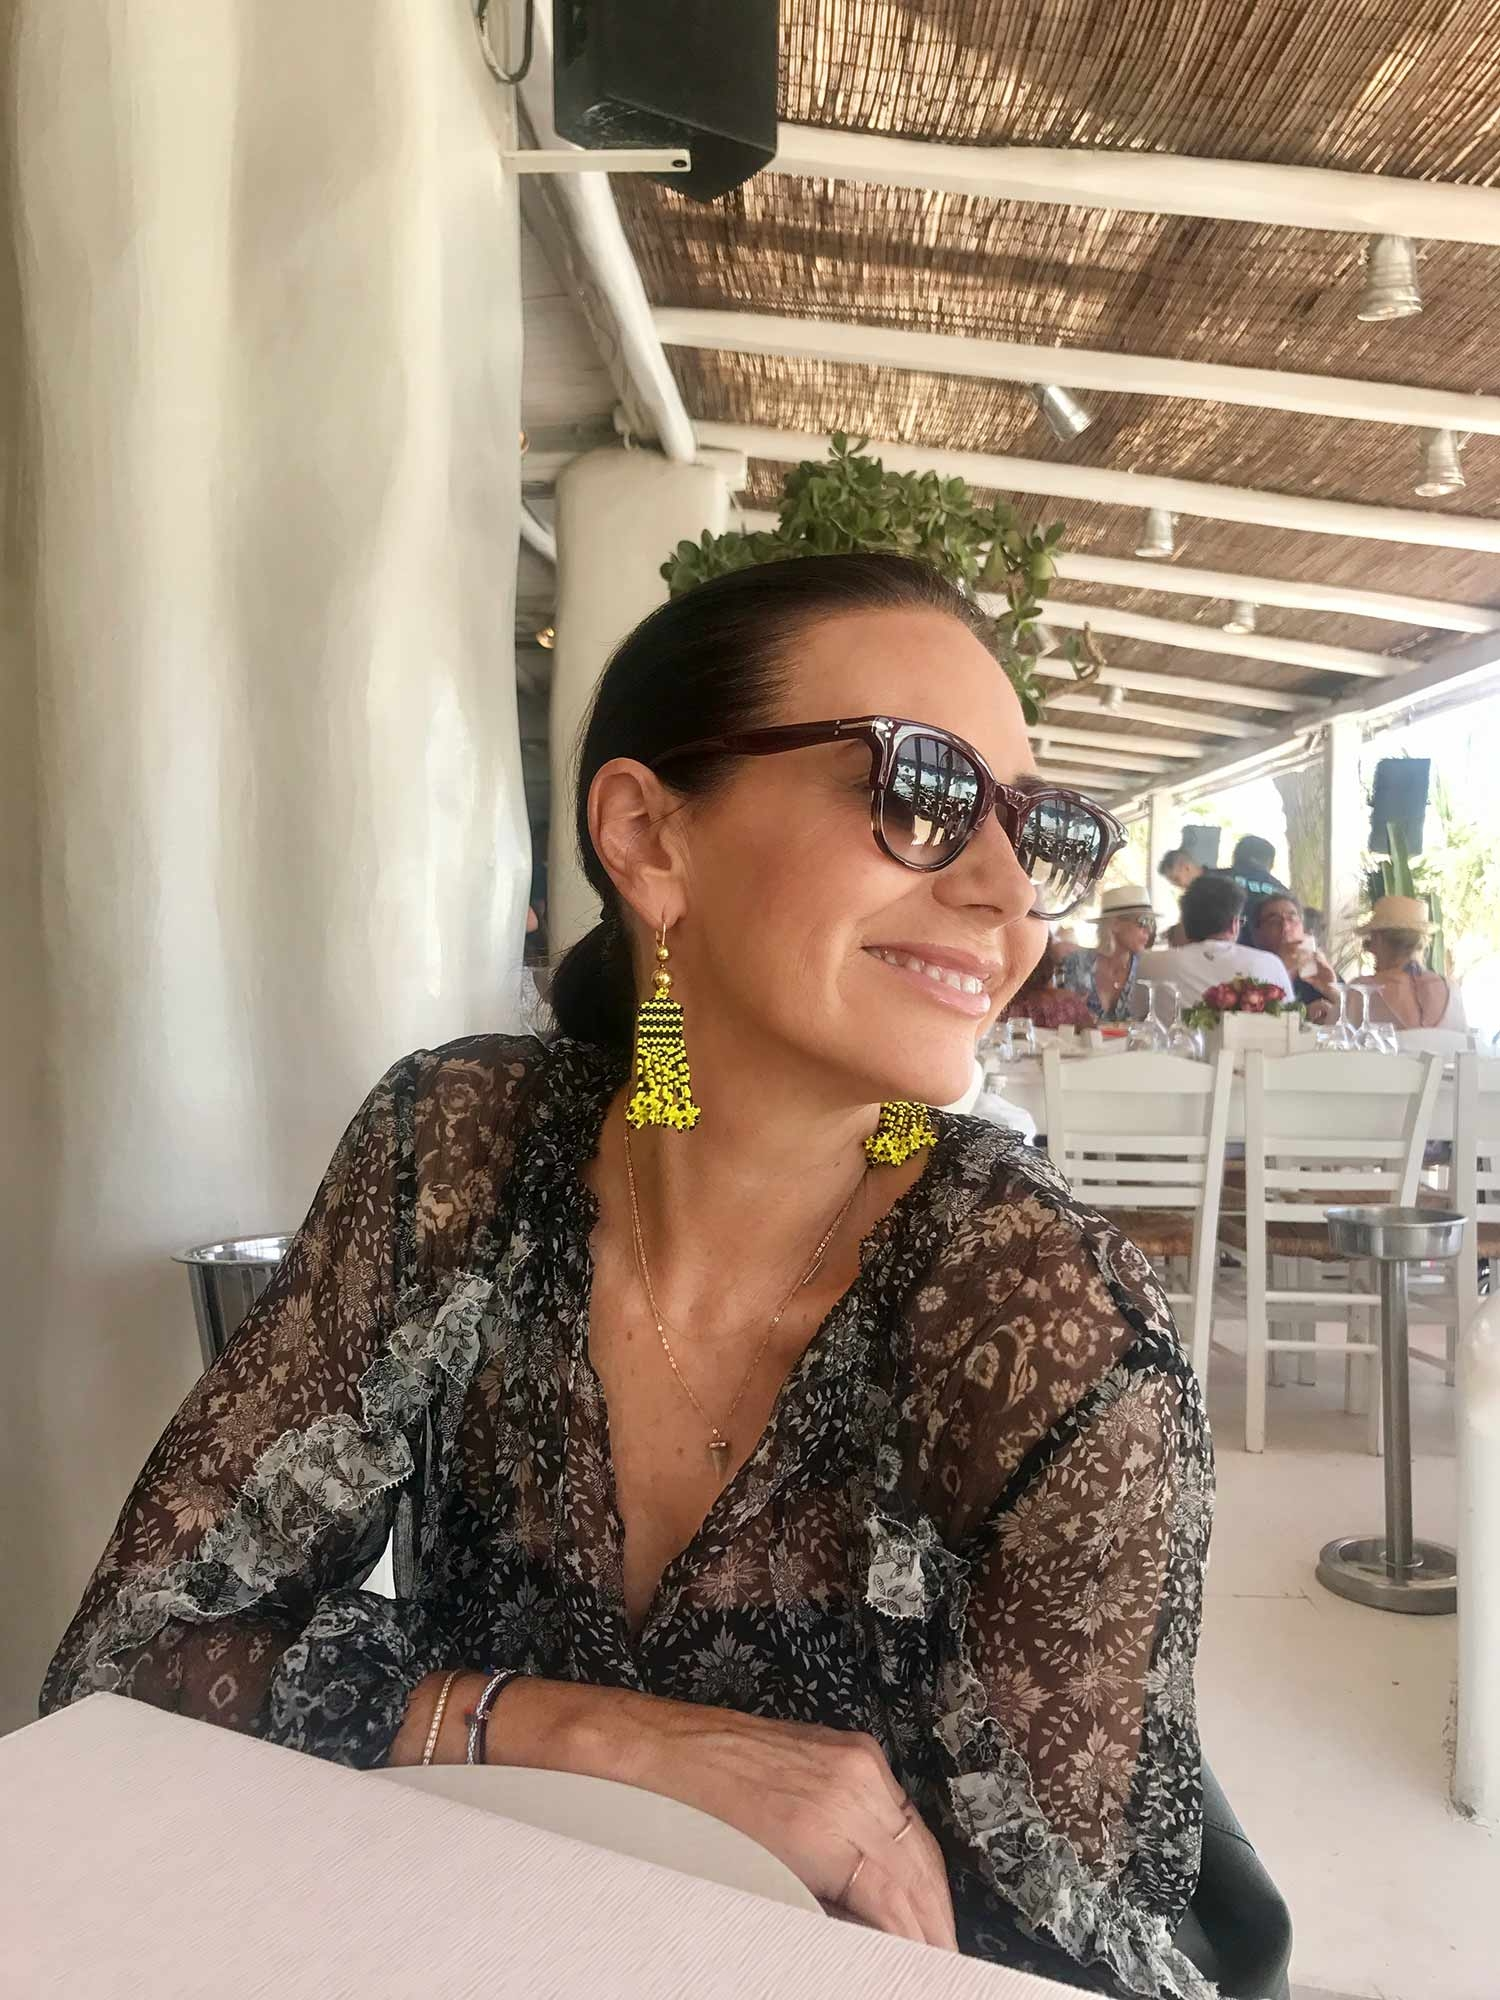 Nicky Zimmermann wearing vibrant holiday earrings. July 2017